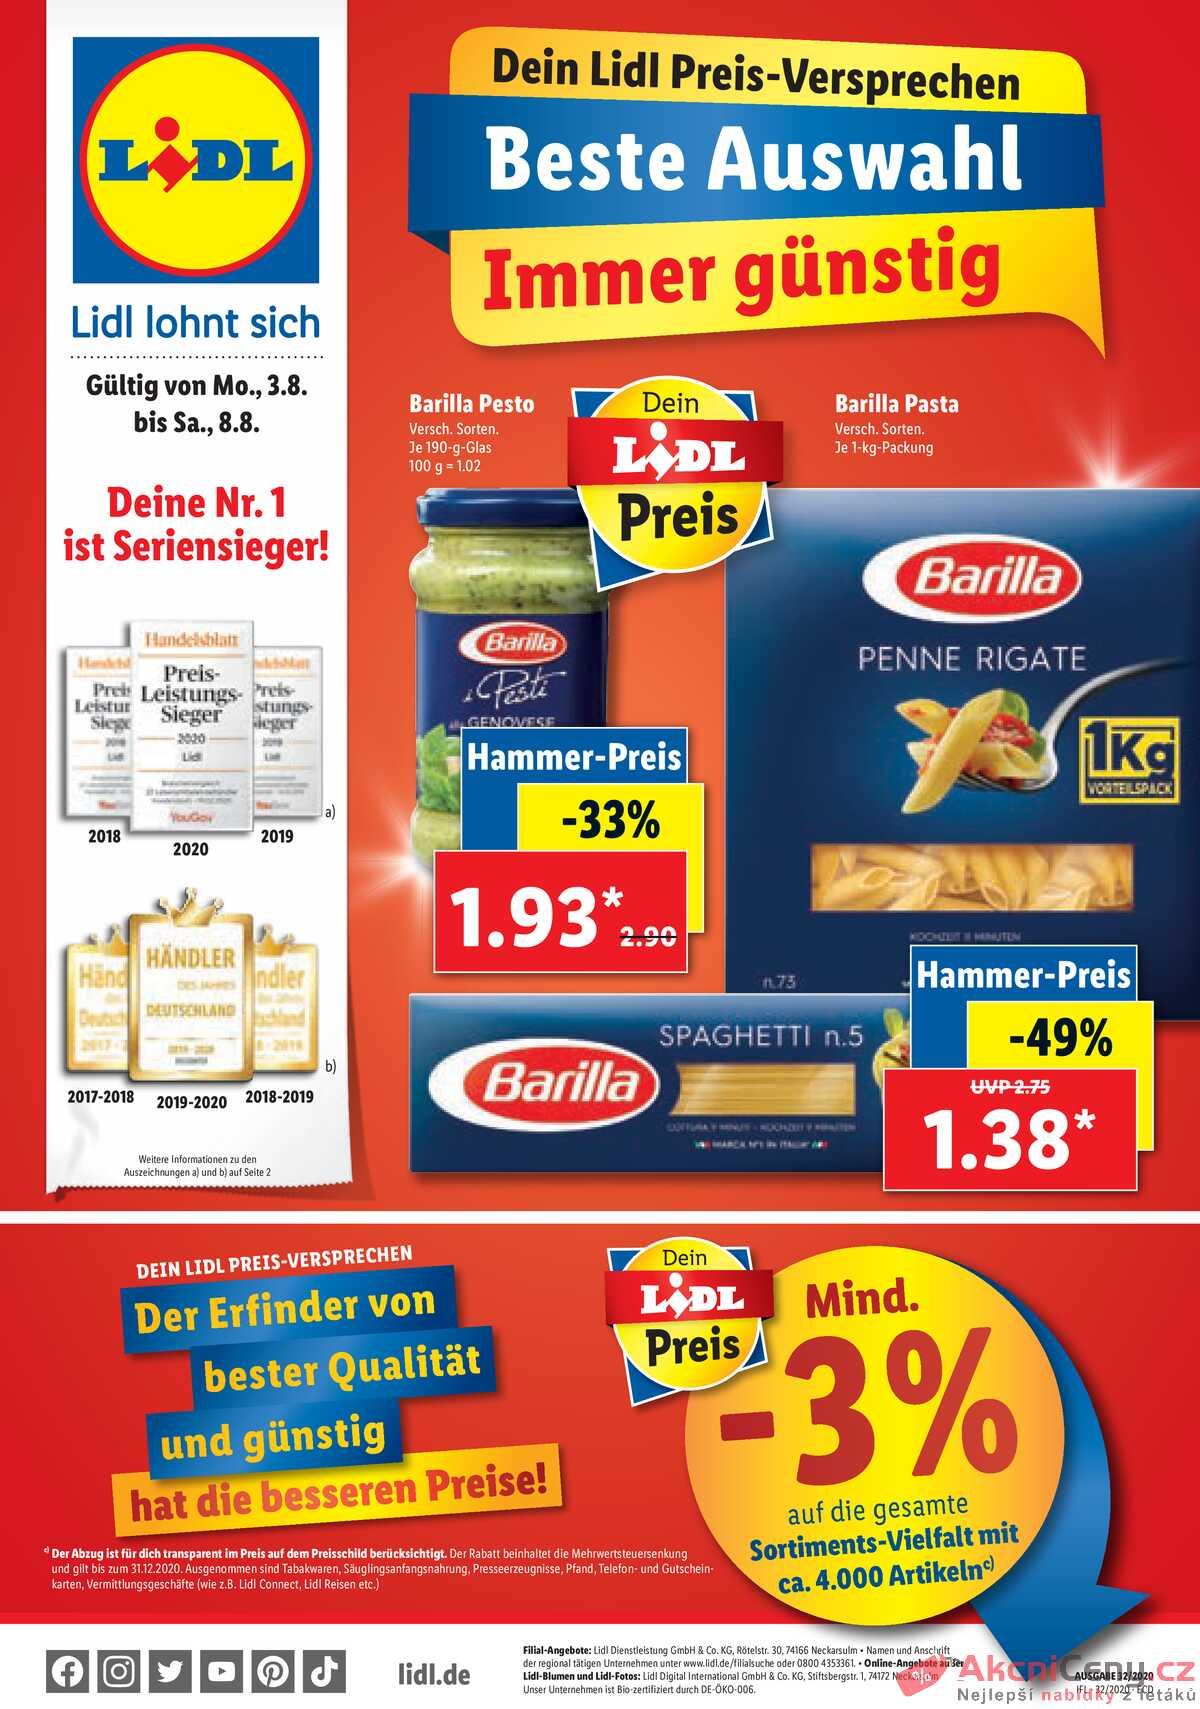 Leták Lidl Deutschland strana 1/40